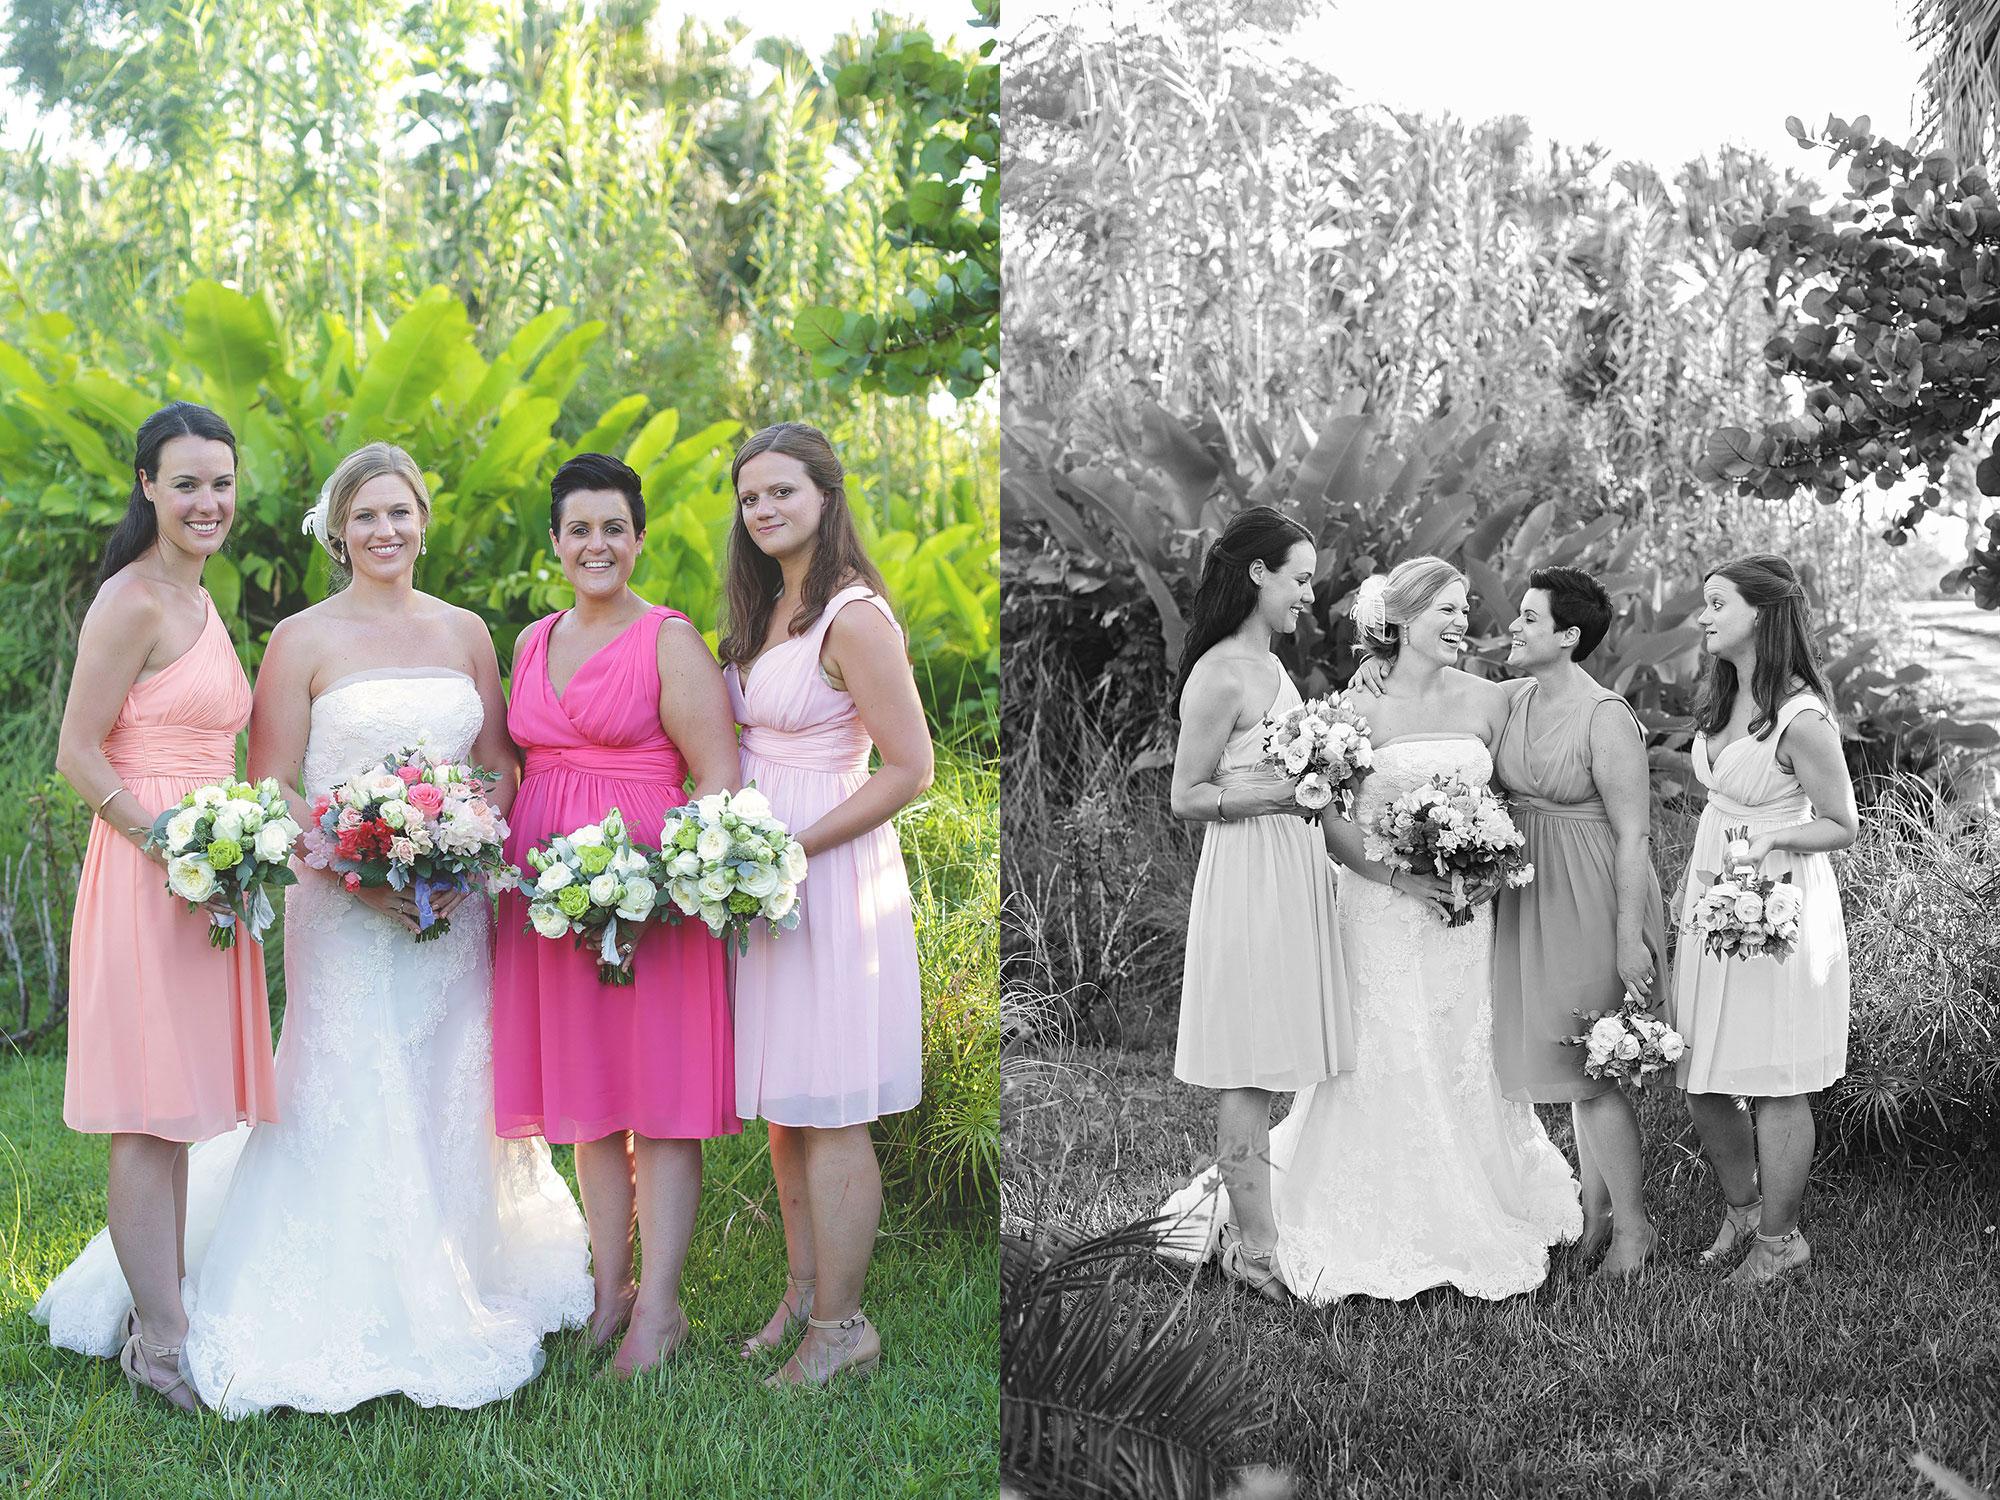 Bermuda wedding photographer destination photography Hamilton Cambridge Beaches St Georges Bermuda Islands Bride Groom